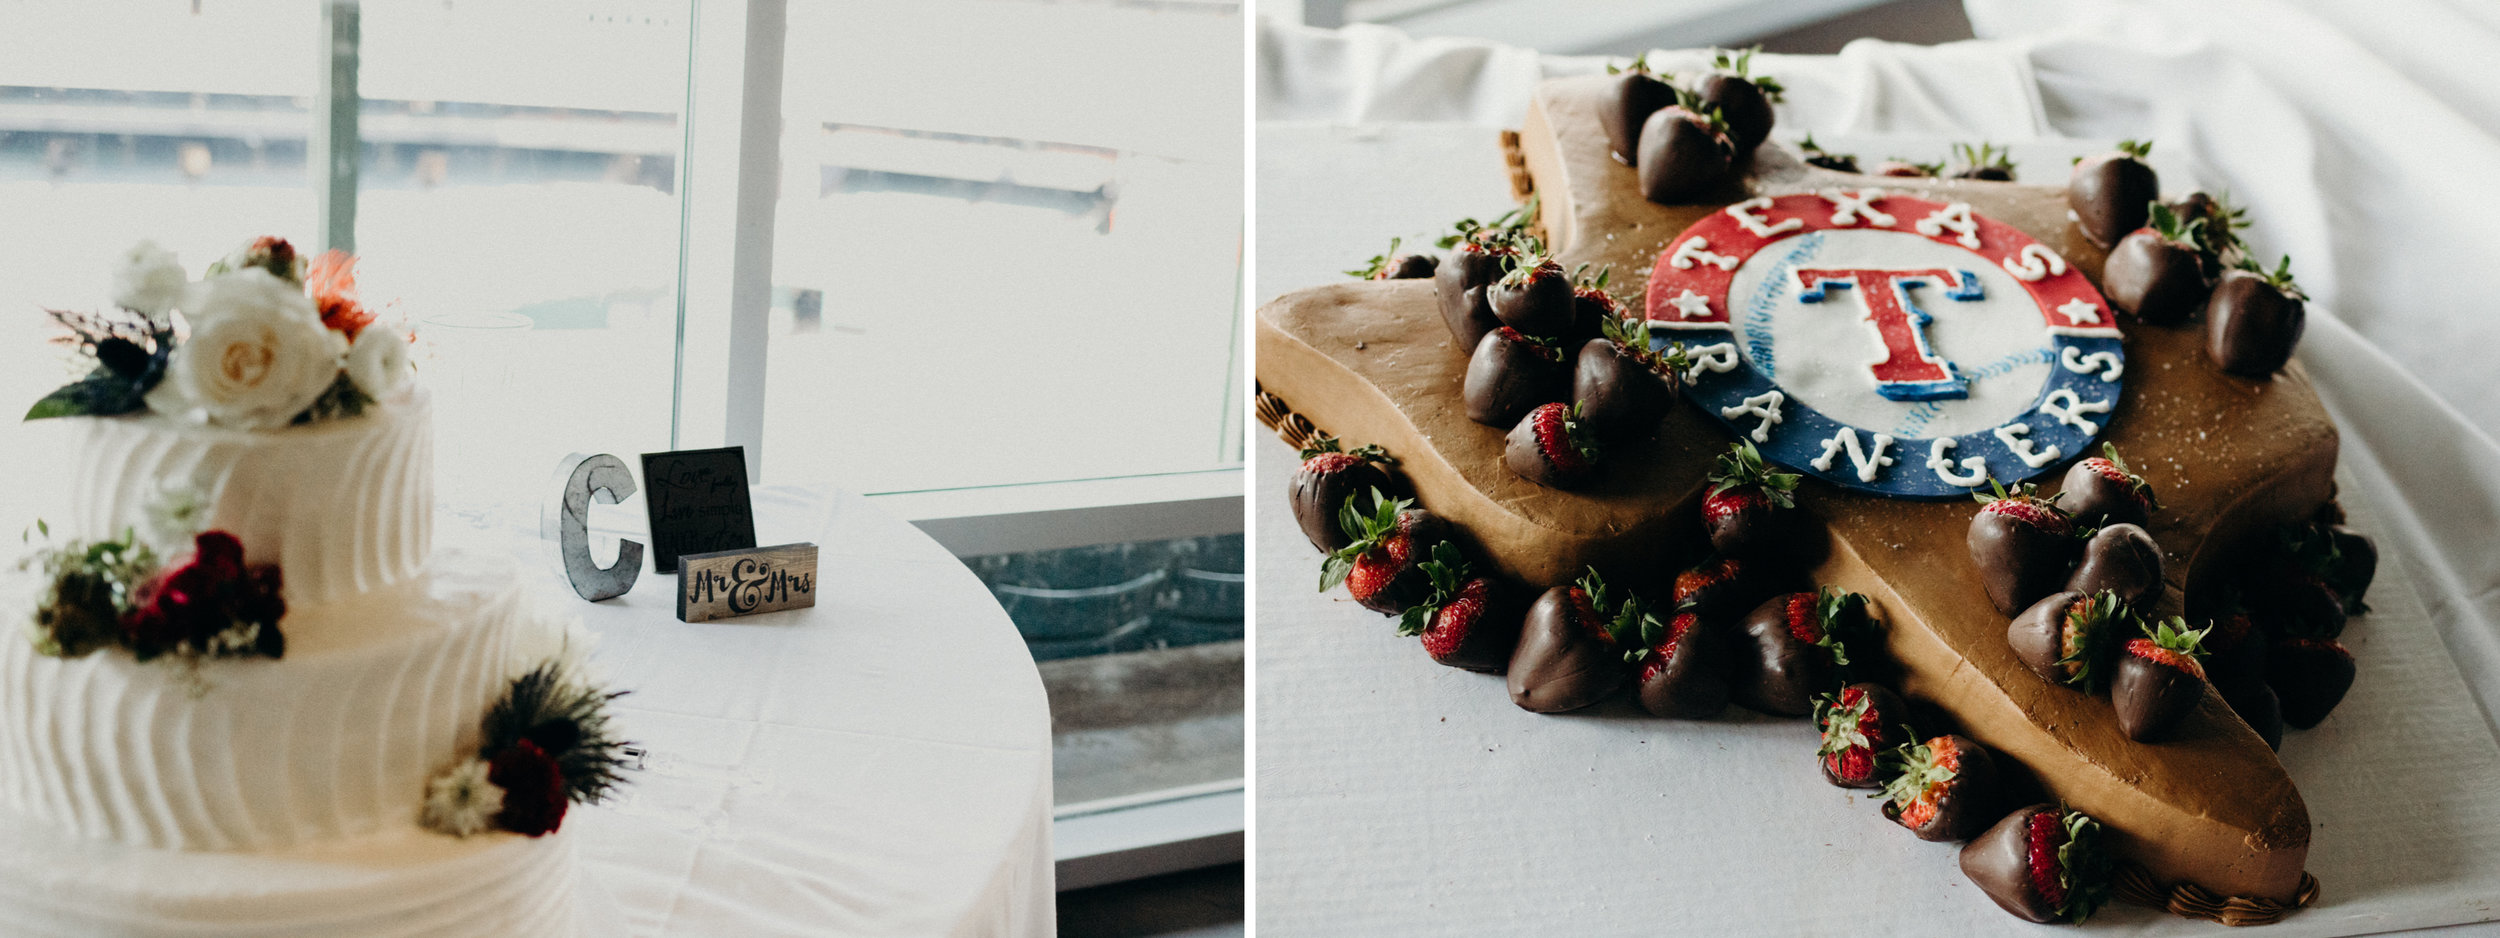 clanton cakes.jpg